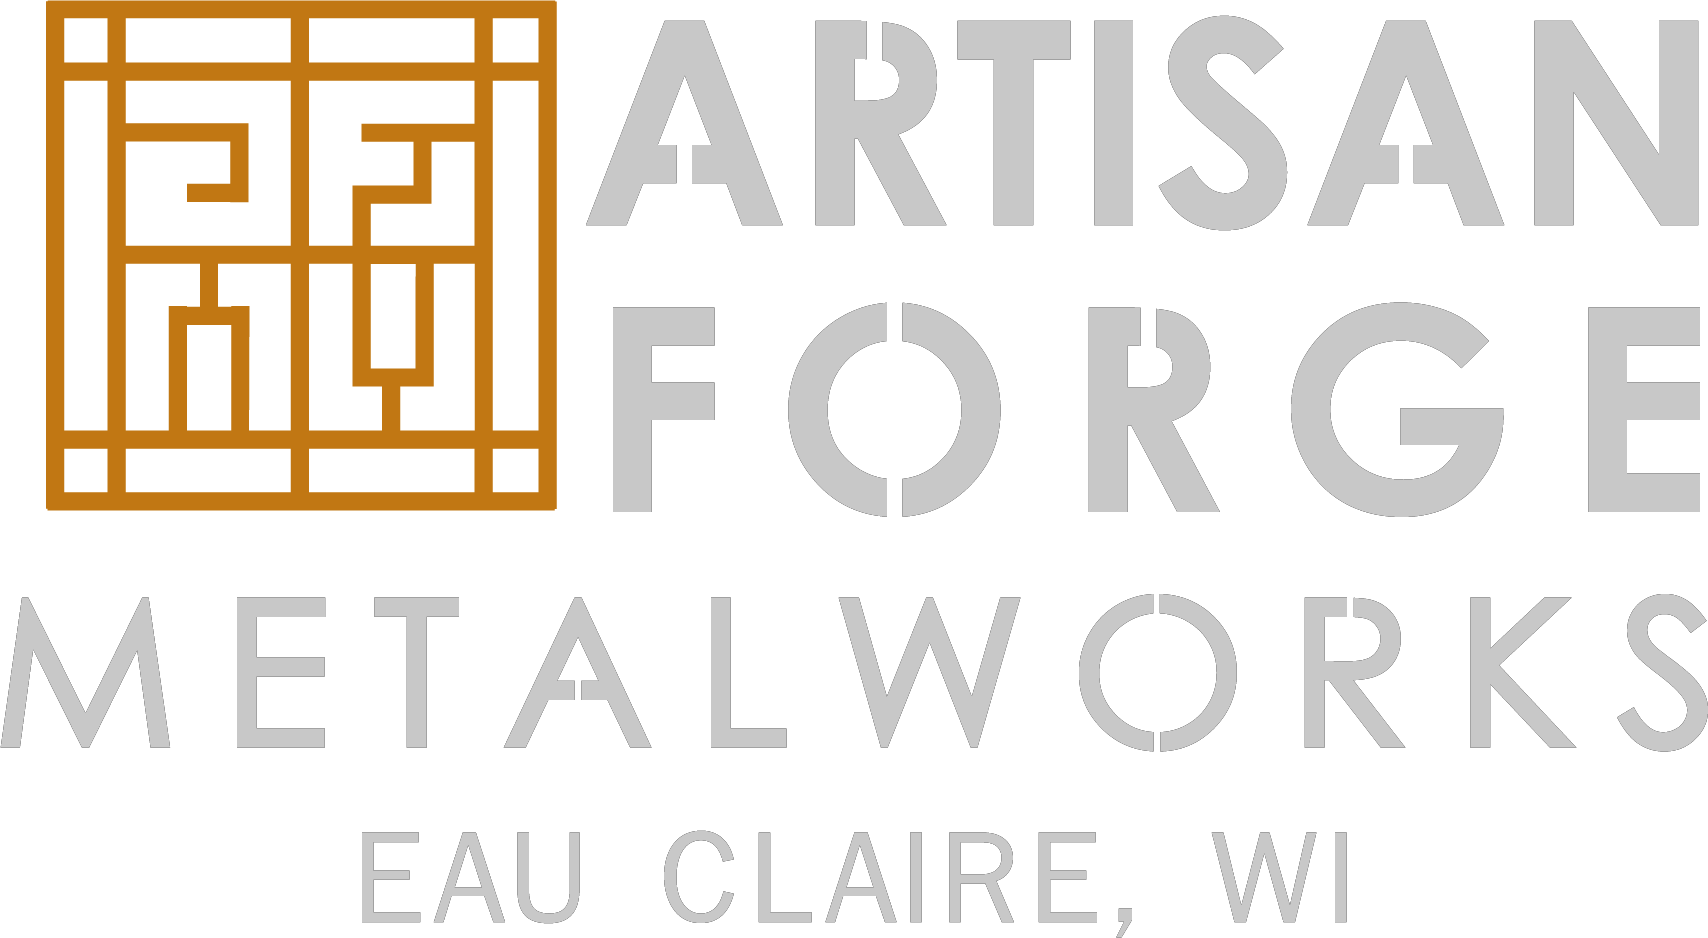 Artisan Forge MetalWorks Logo